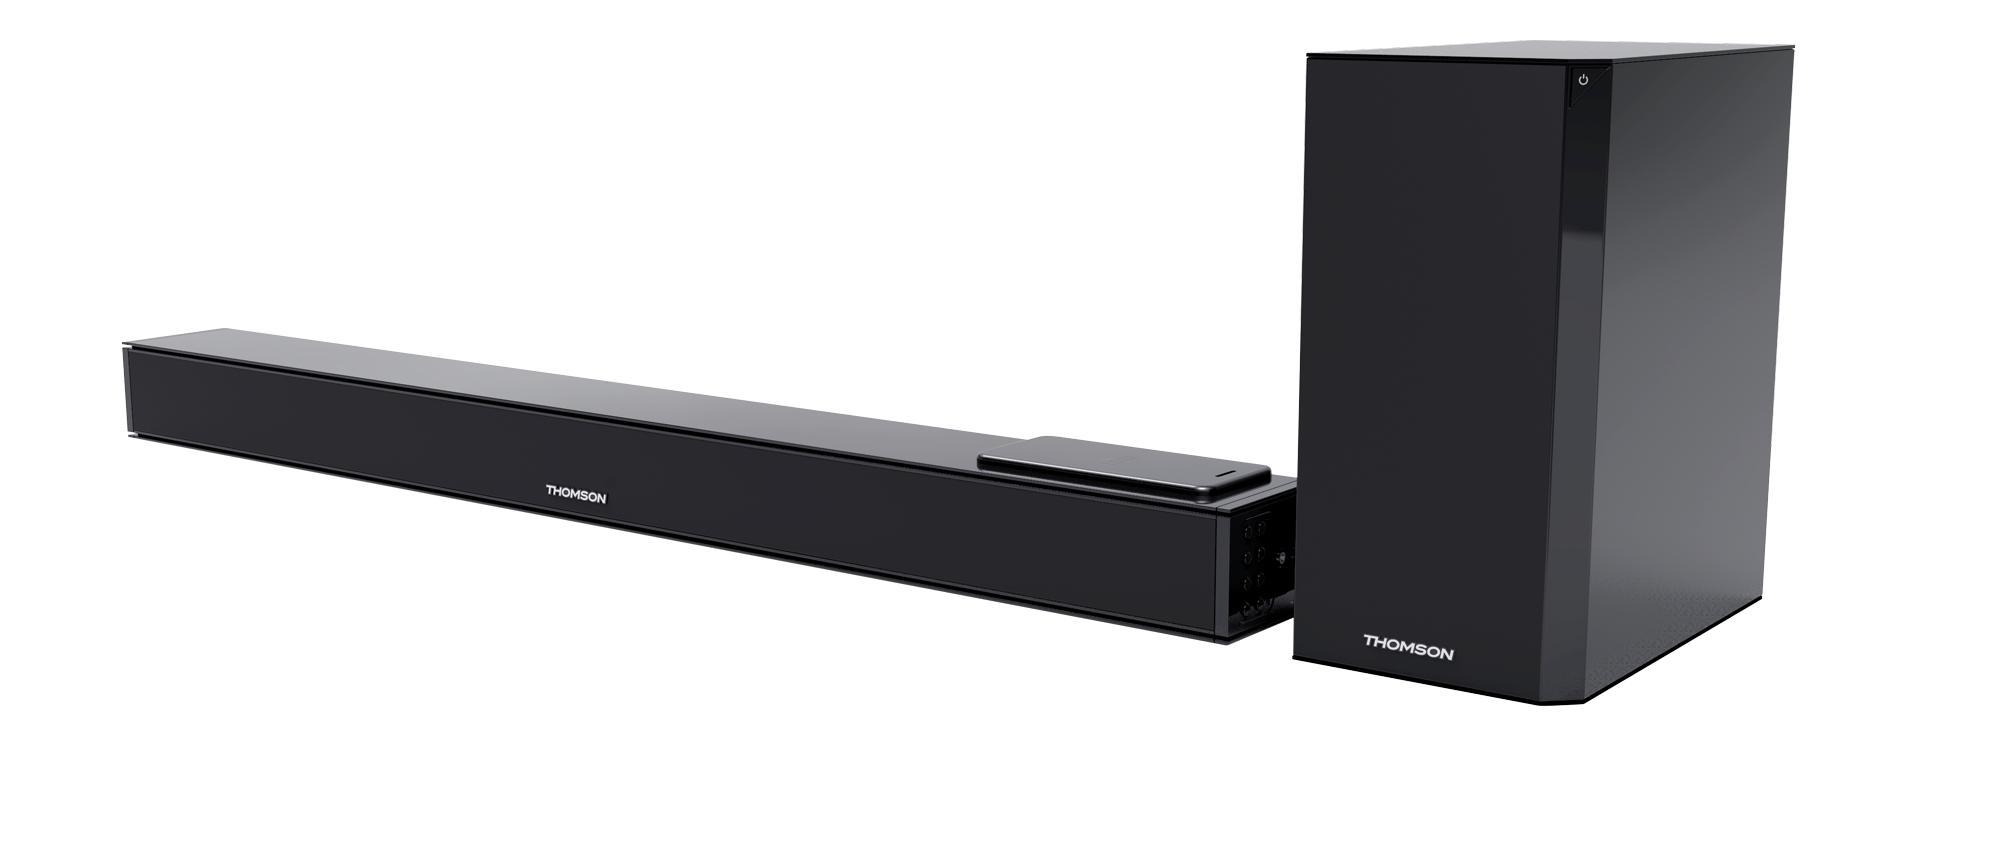 BIGBEN INTERACTIVE SB260IBT haut-parleur soundbar 2.1 canaux 300 W Noir